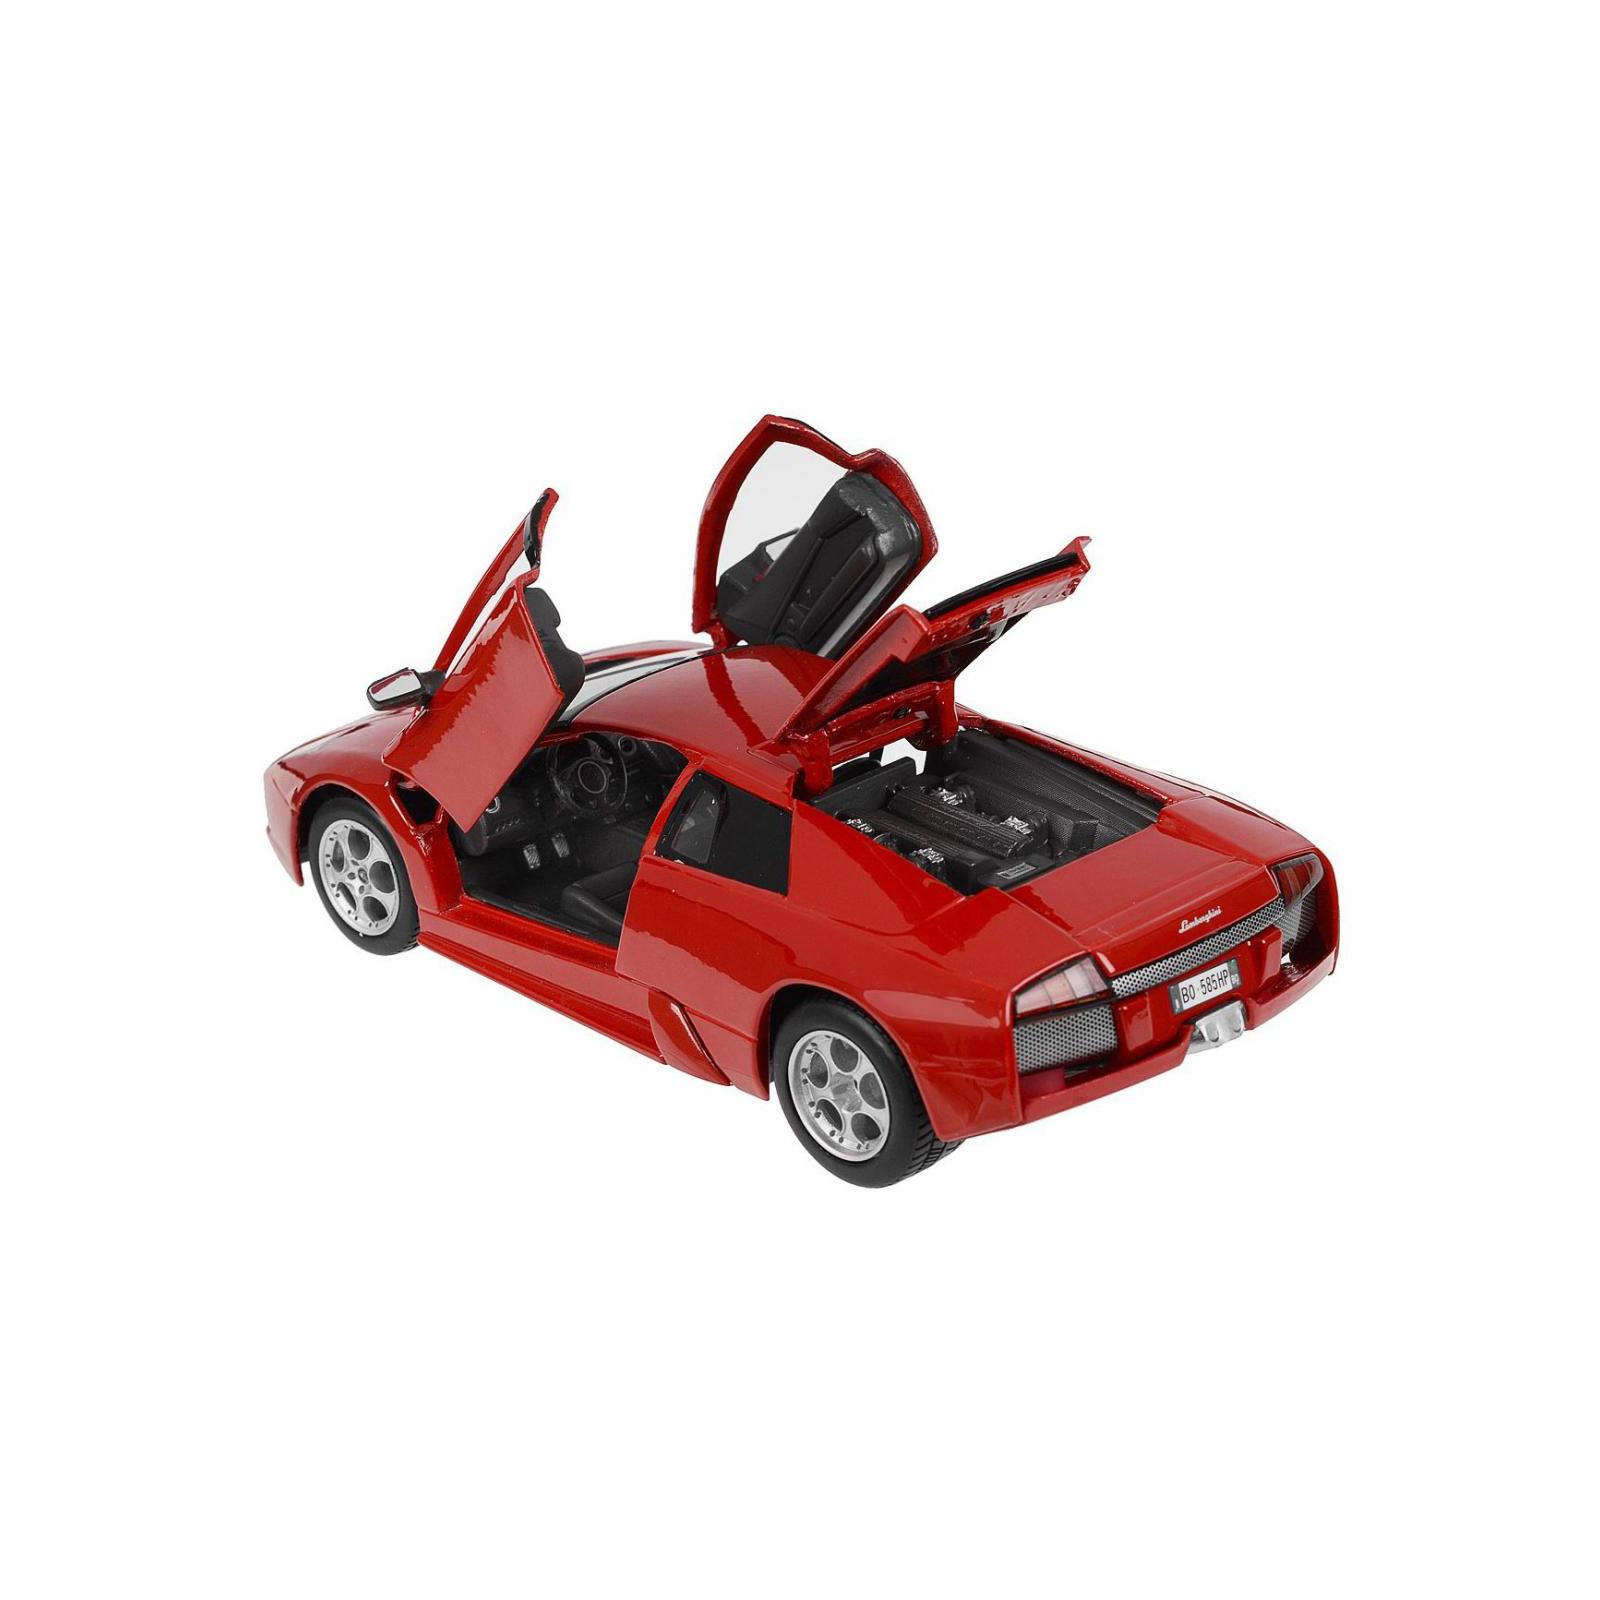 Машина Maisto Lamborghini Murcielago (1:24) красный металлик (31238 red) изображение 3